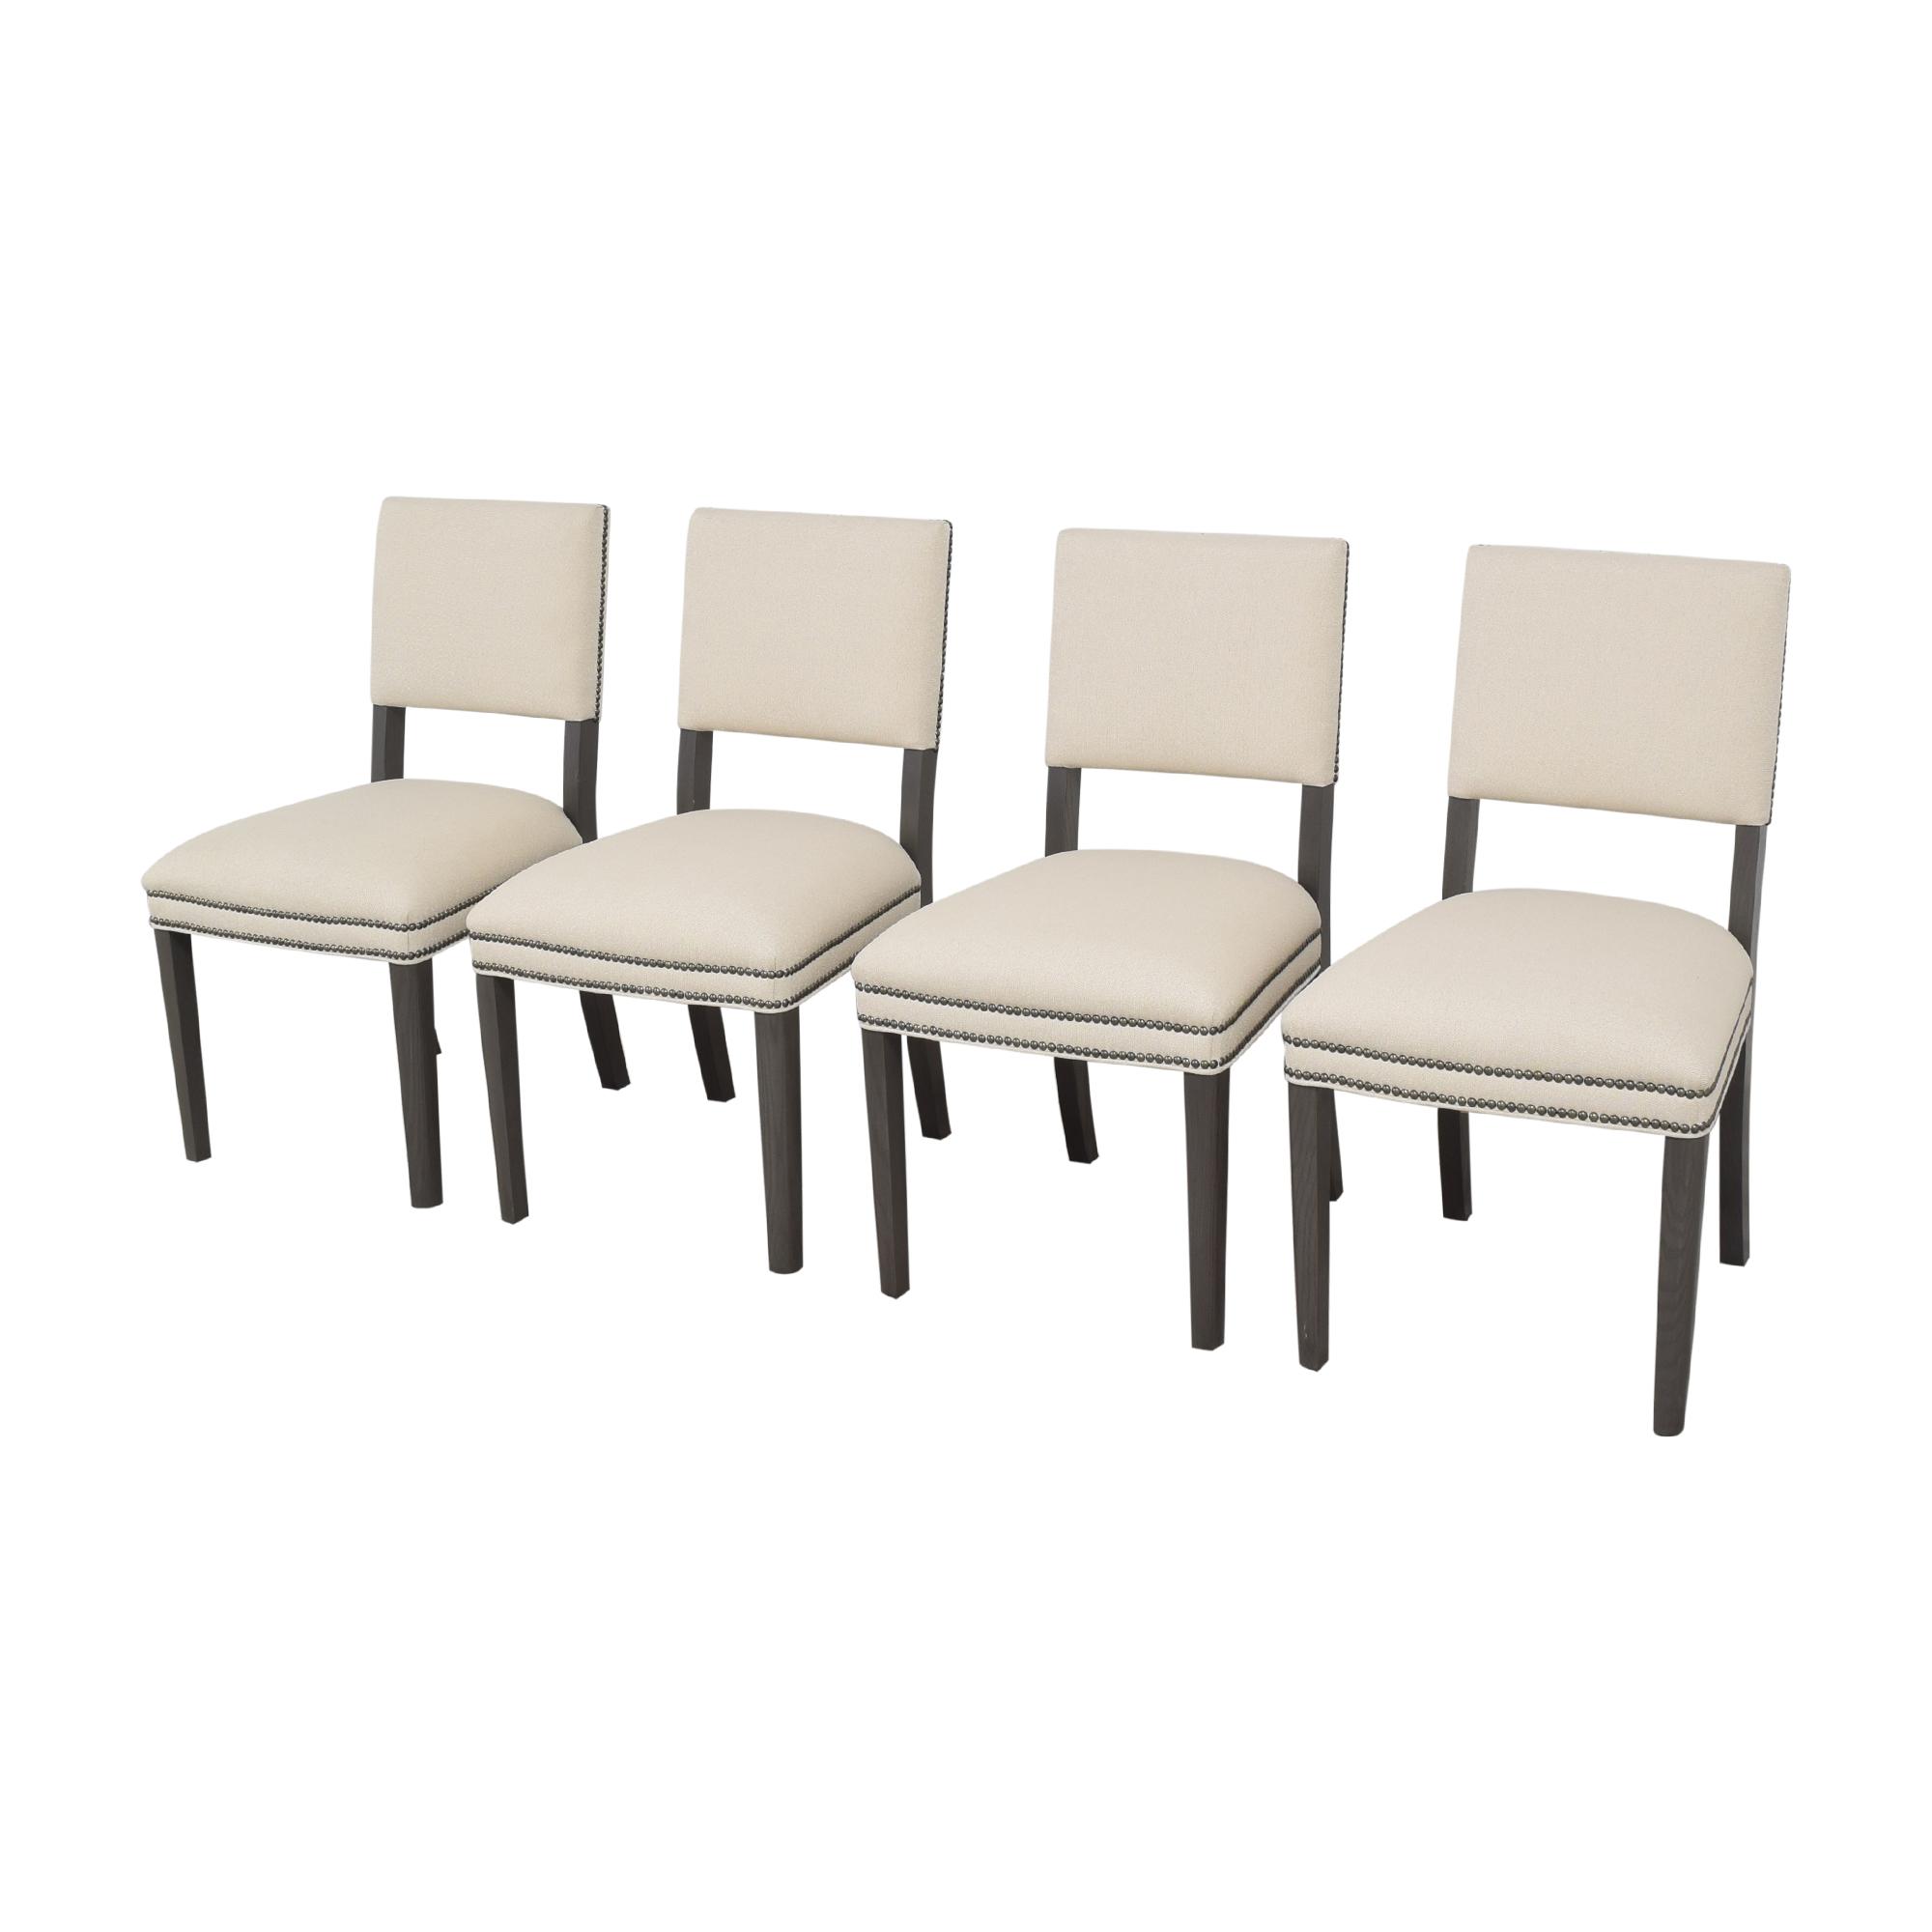 Vanguard Furniture Vanguard Furniture Newton Stocked Dining Chairs nyc